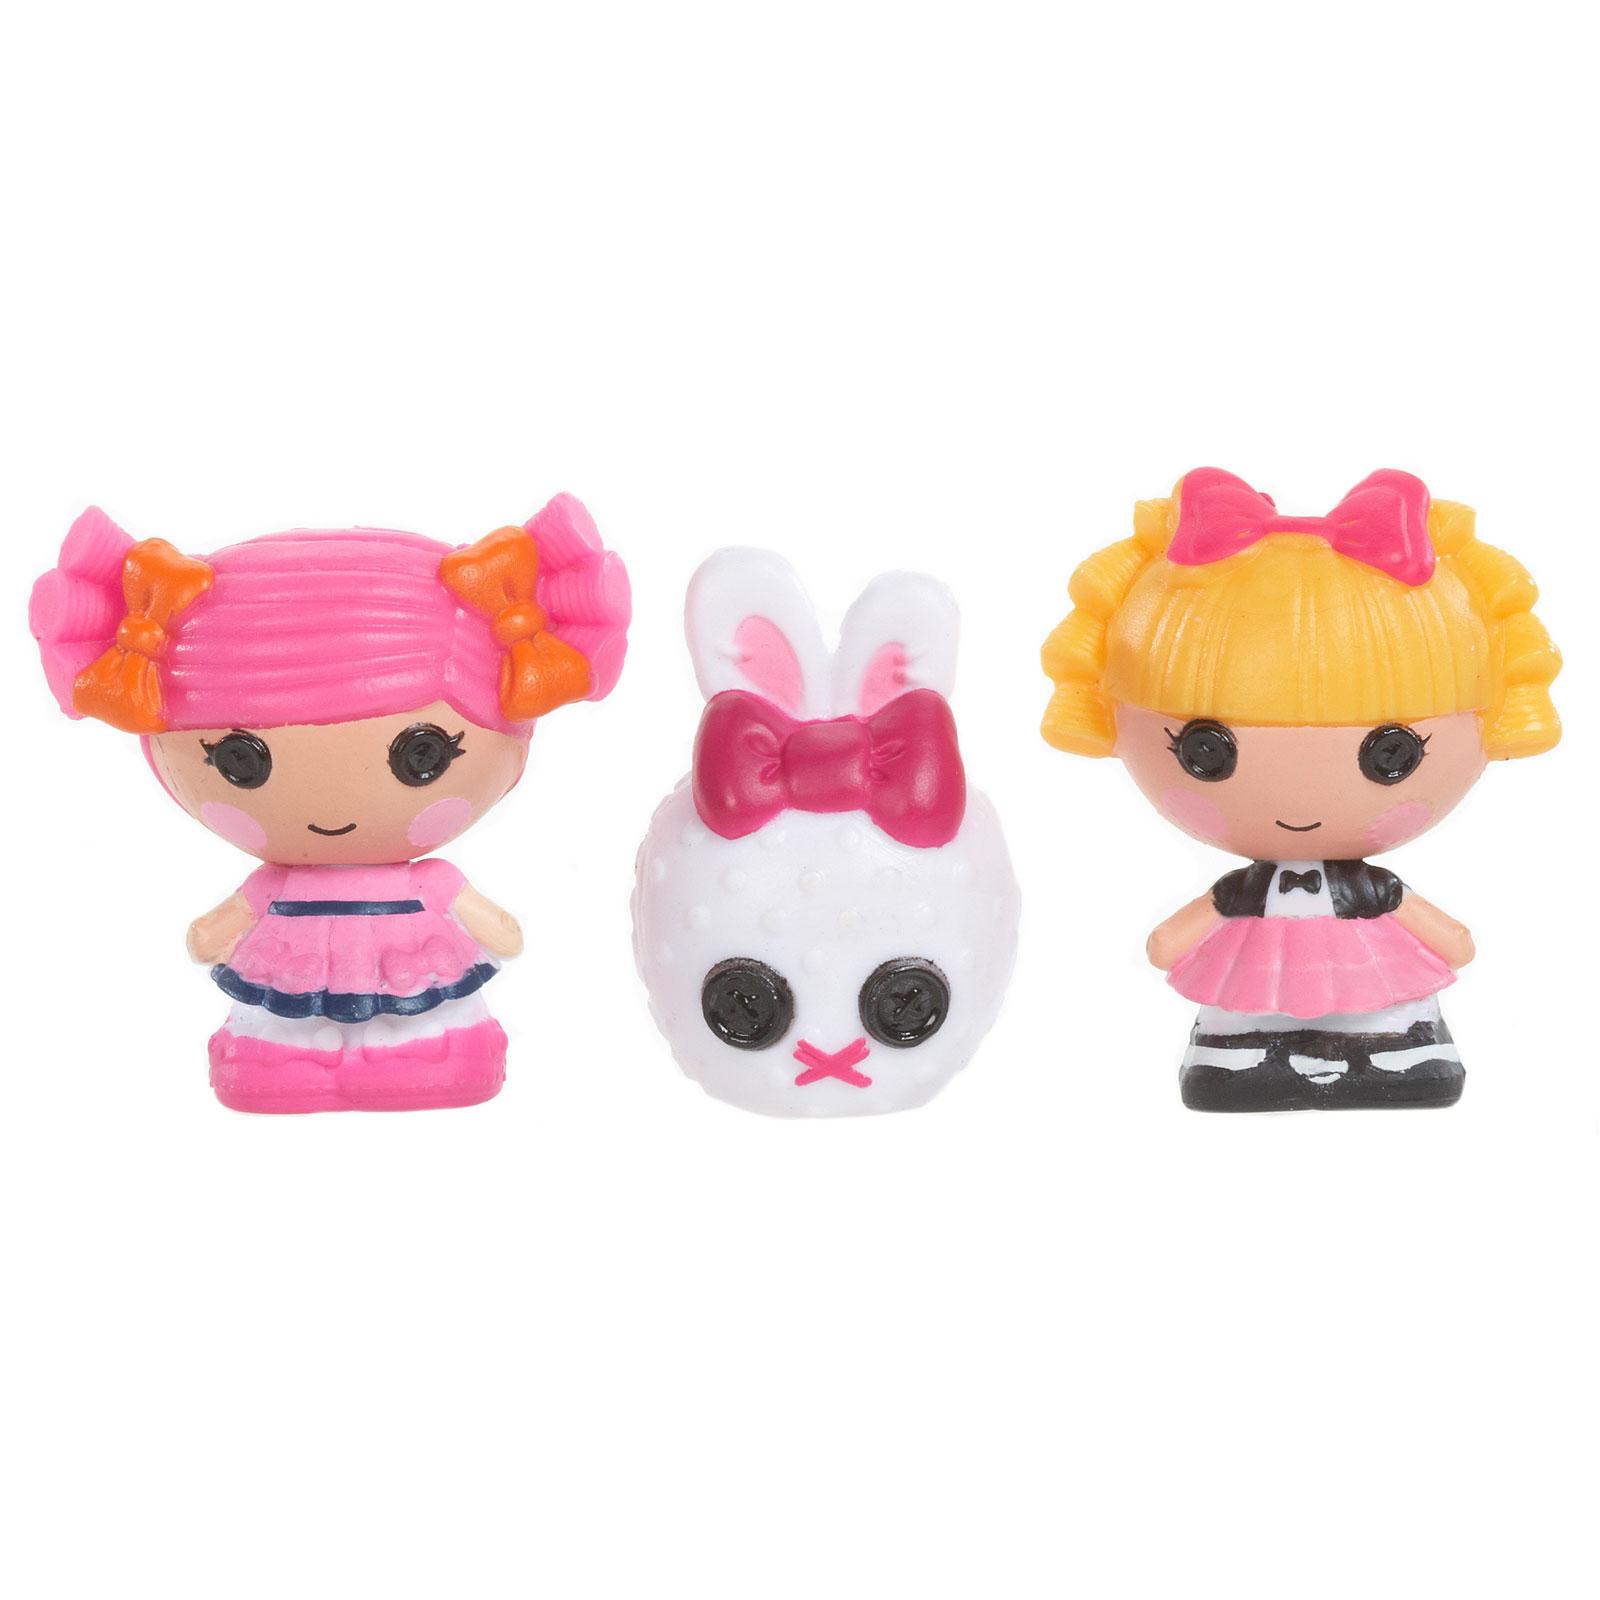 Кукла Mini Lalaloopsy Ягодка, Смешинка, Зайчик